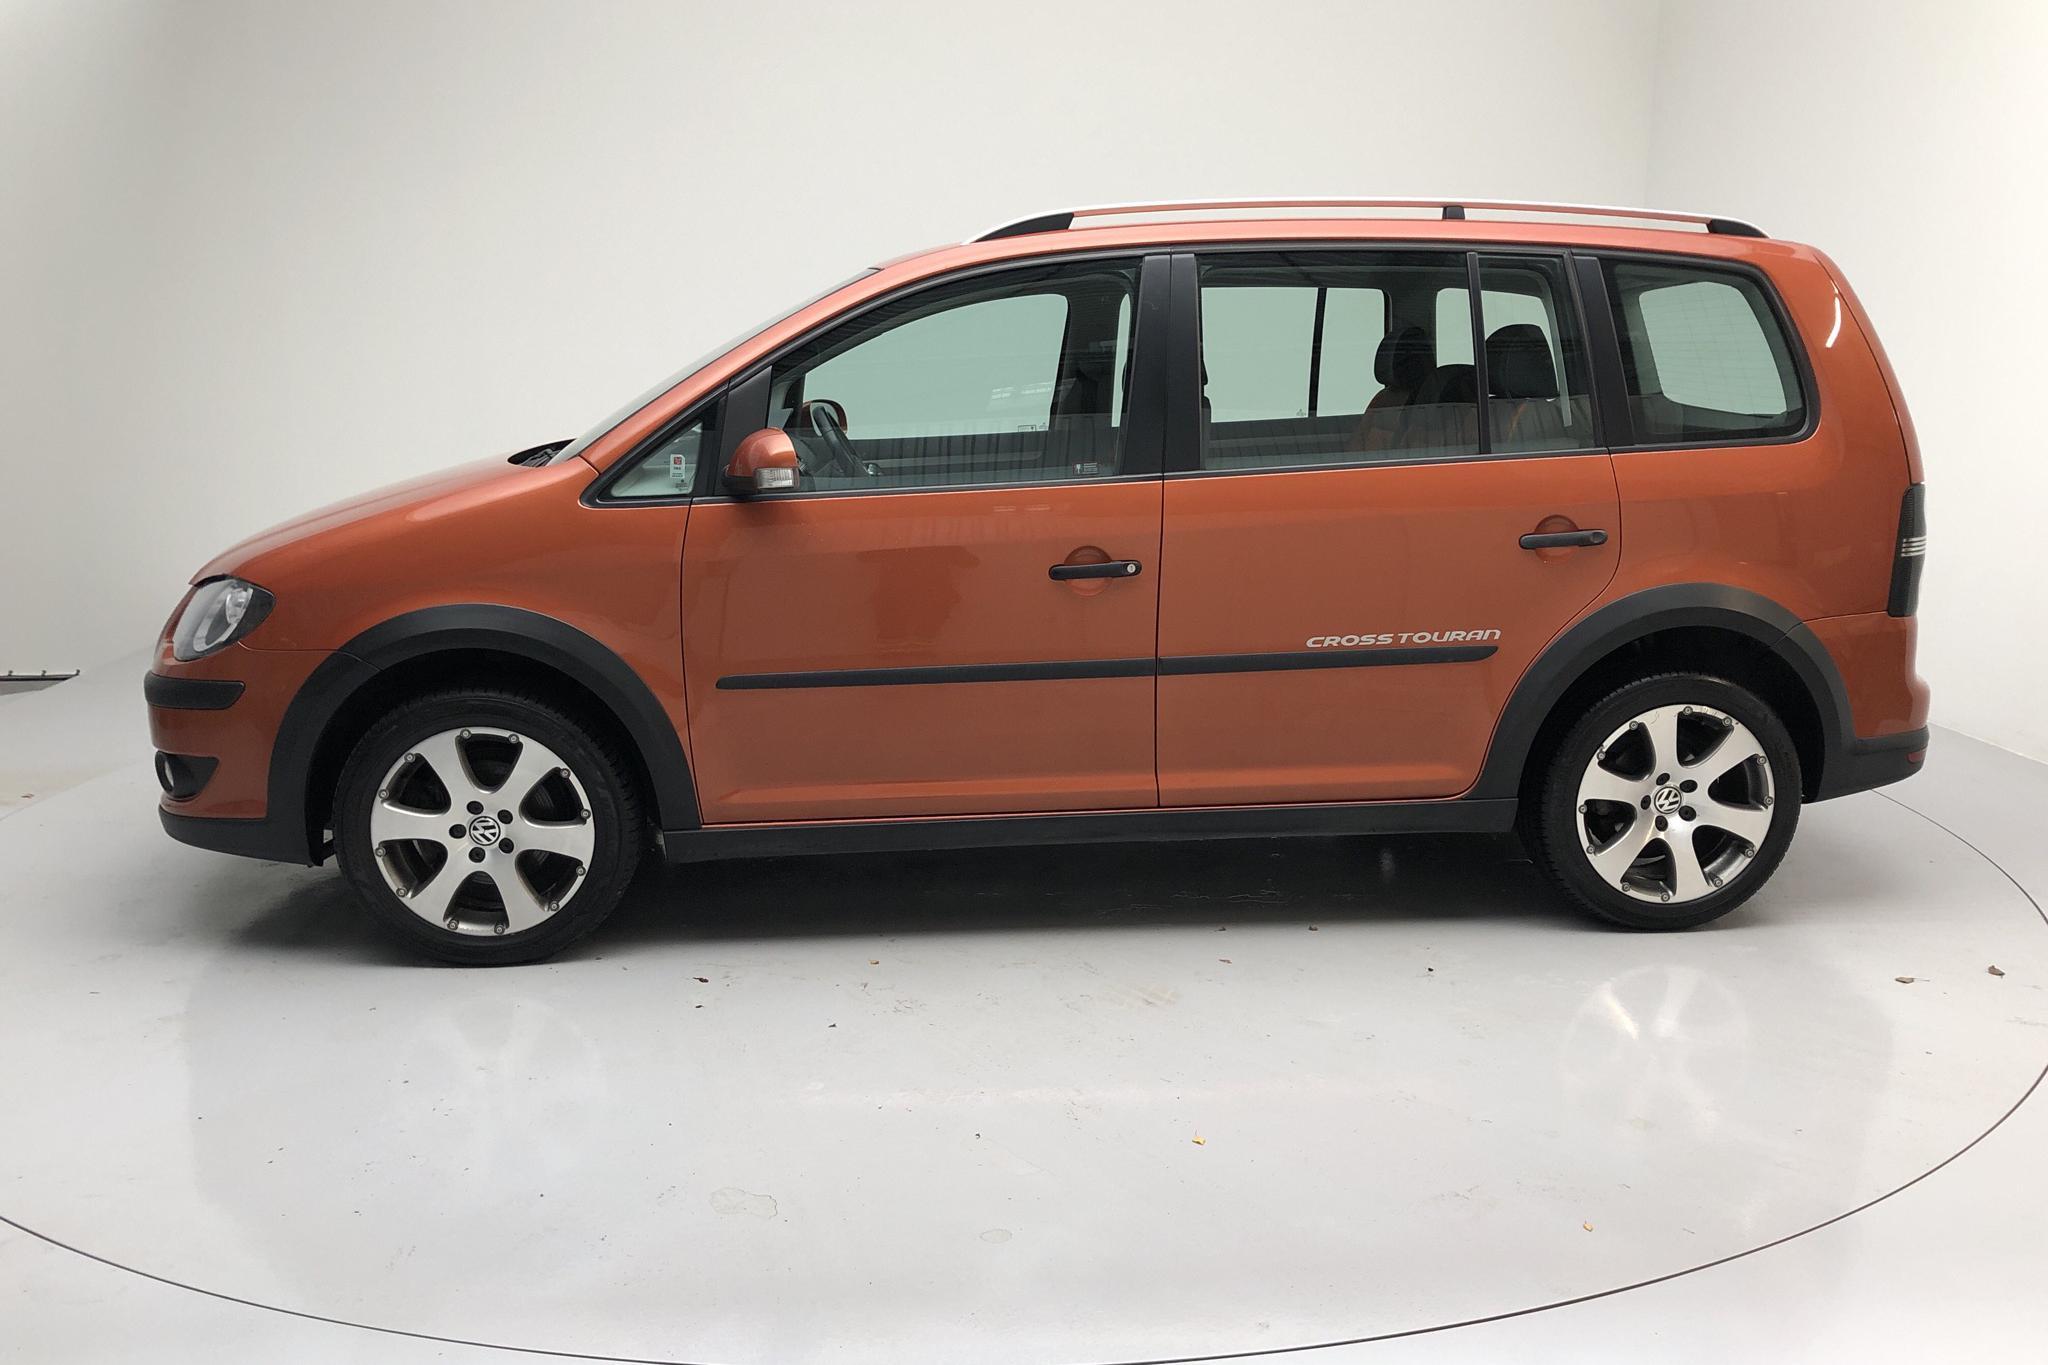 VW CrossTouran 1.4 TSI (140hk) - 12 849 mil - Manuell - brun - 2008